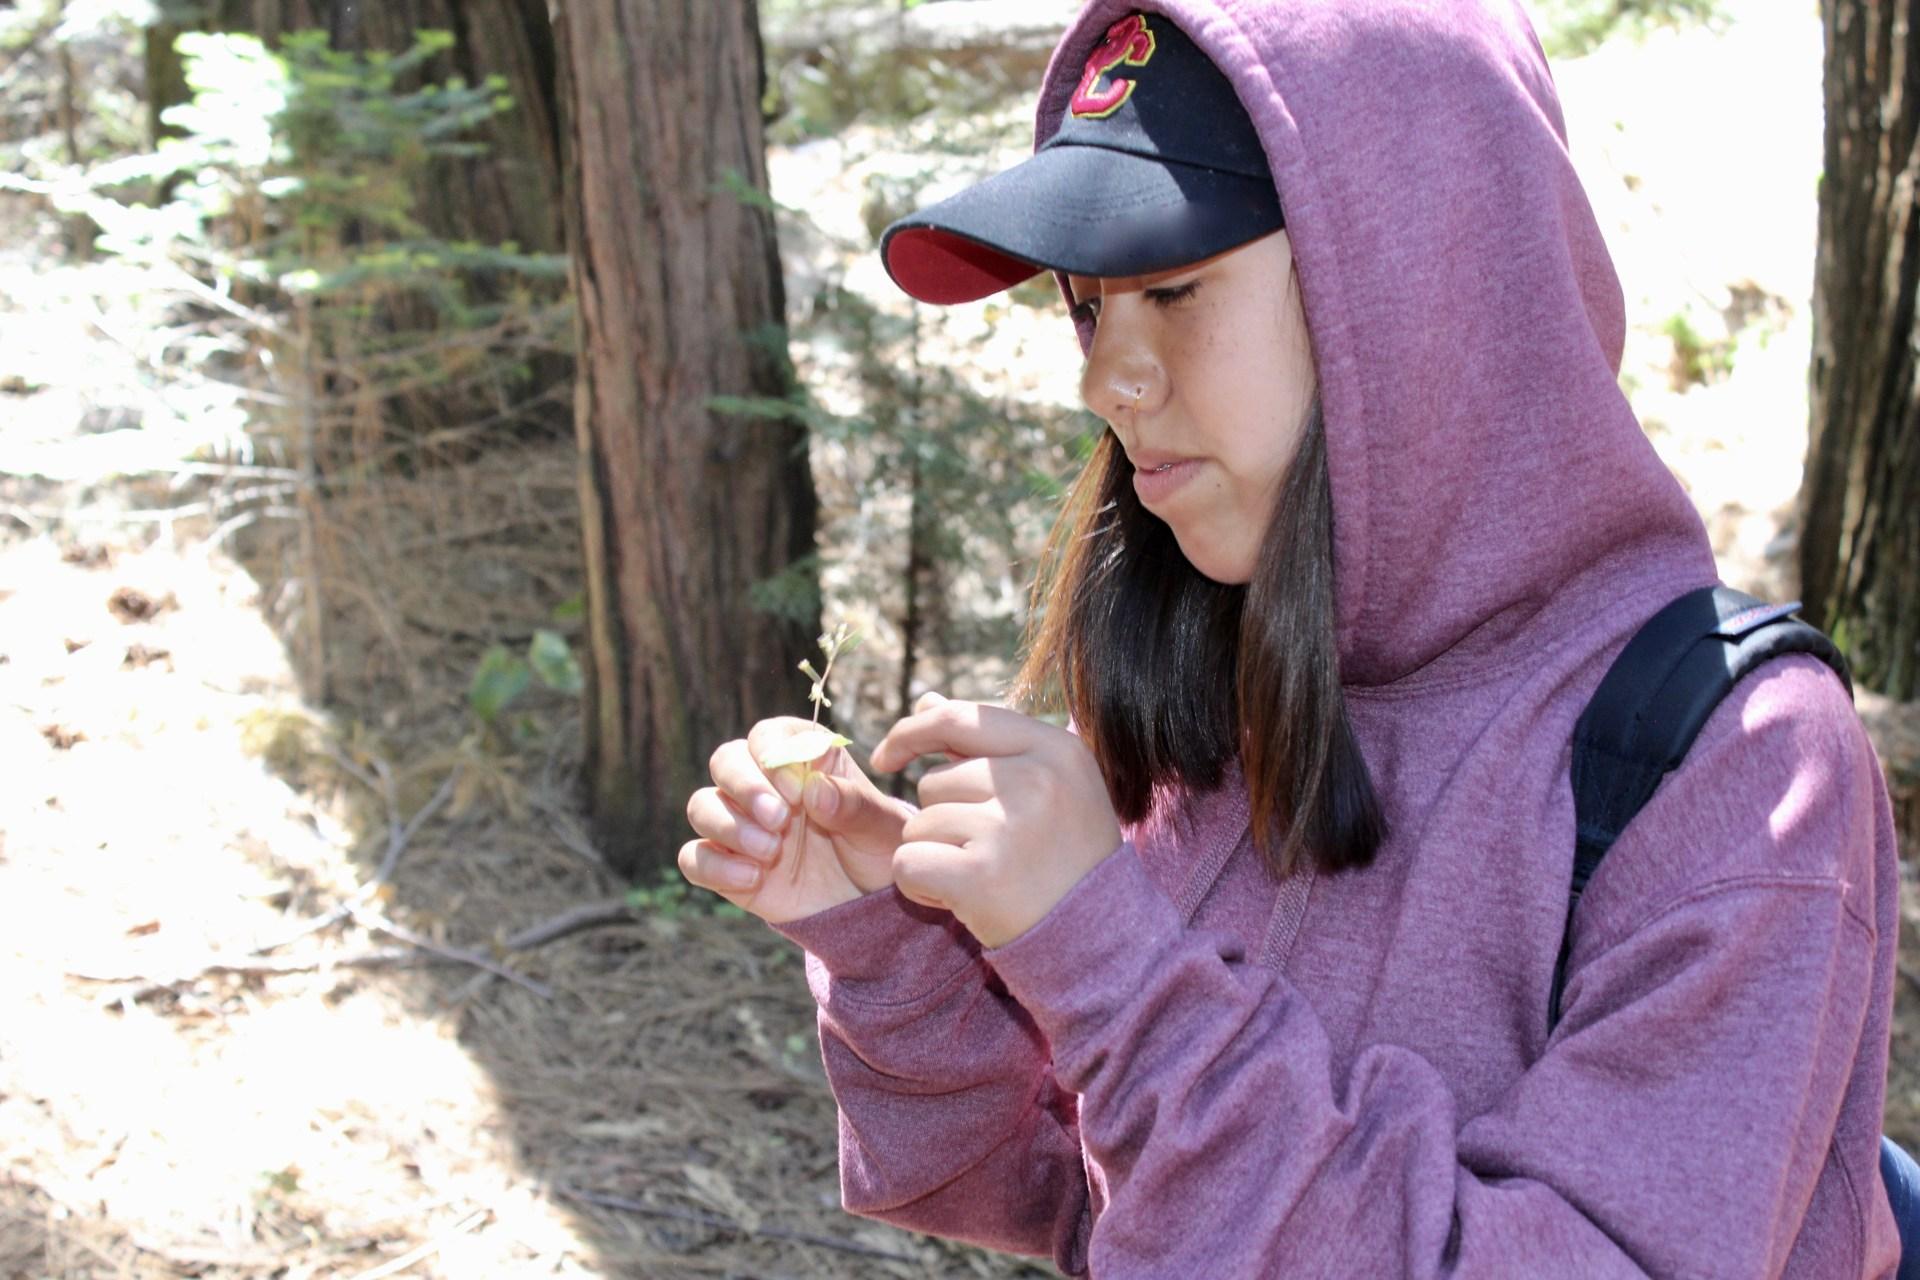 girl studies plant life